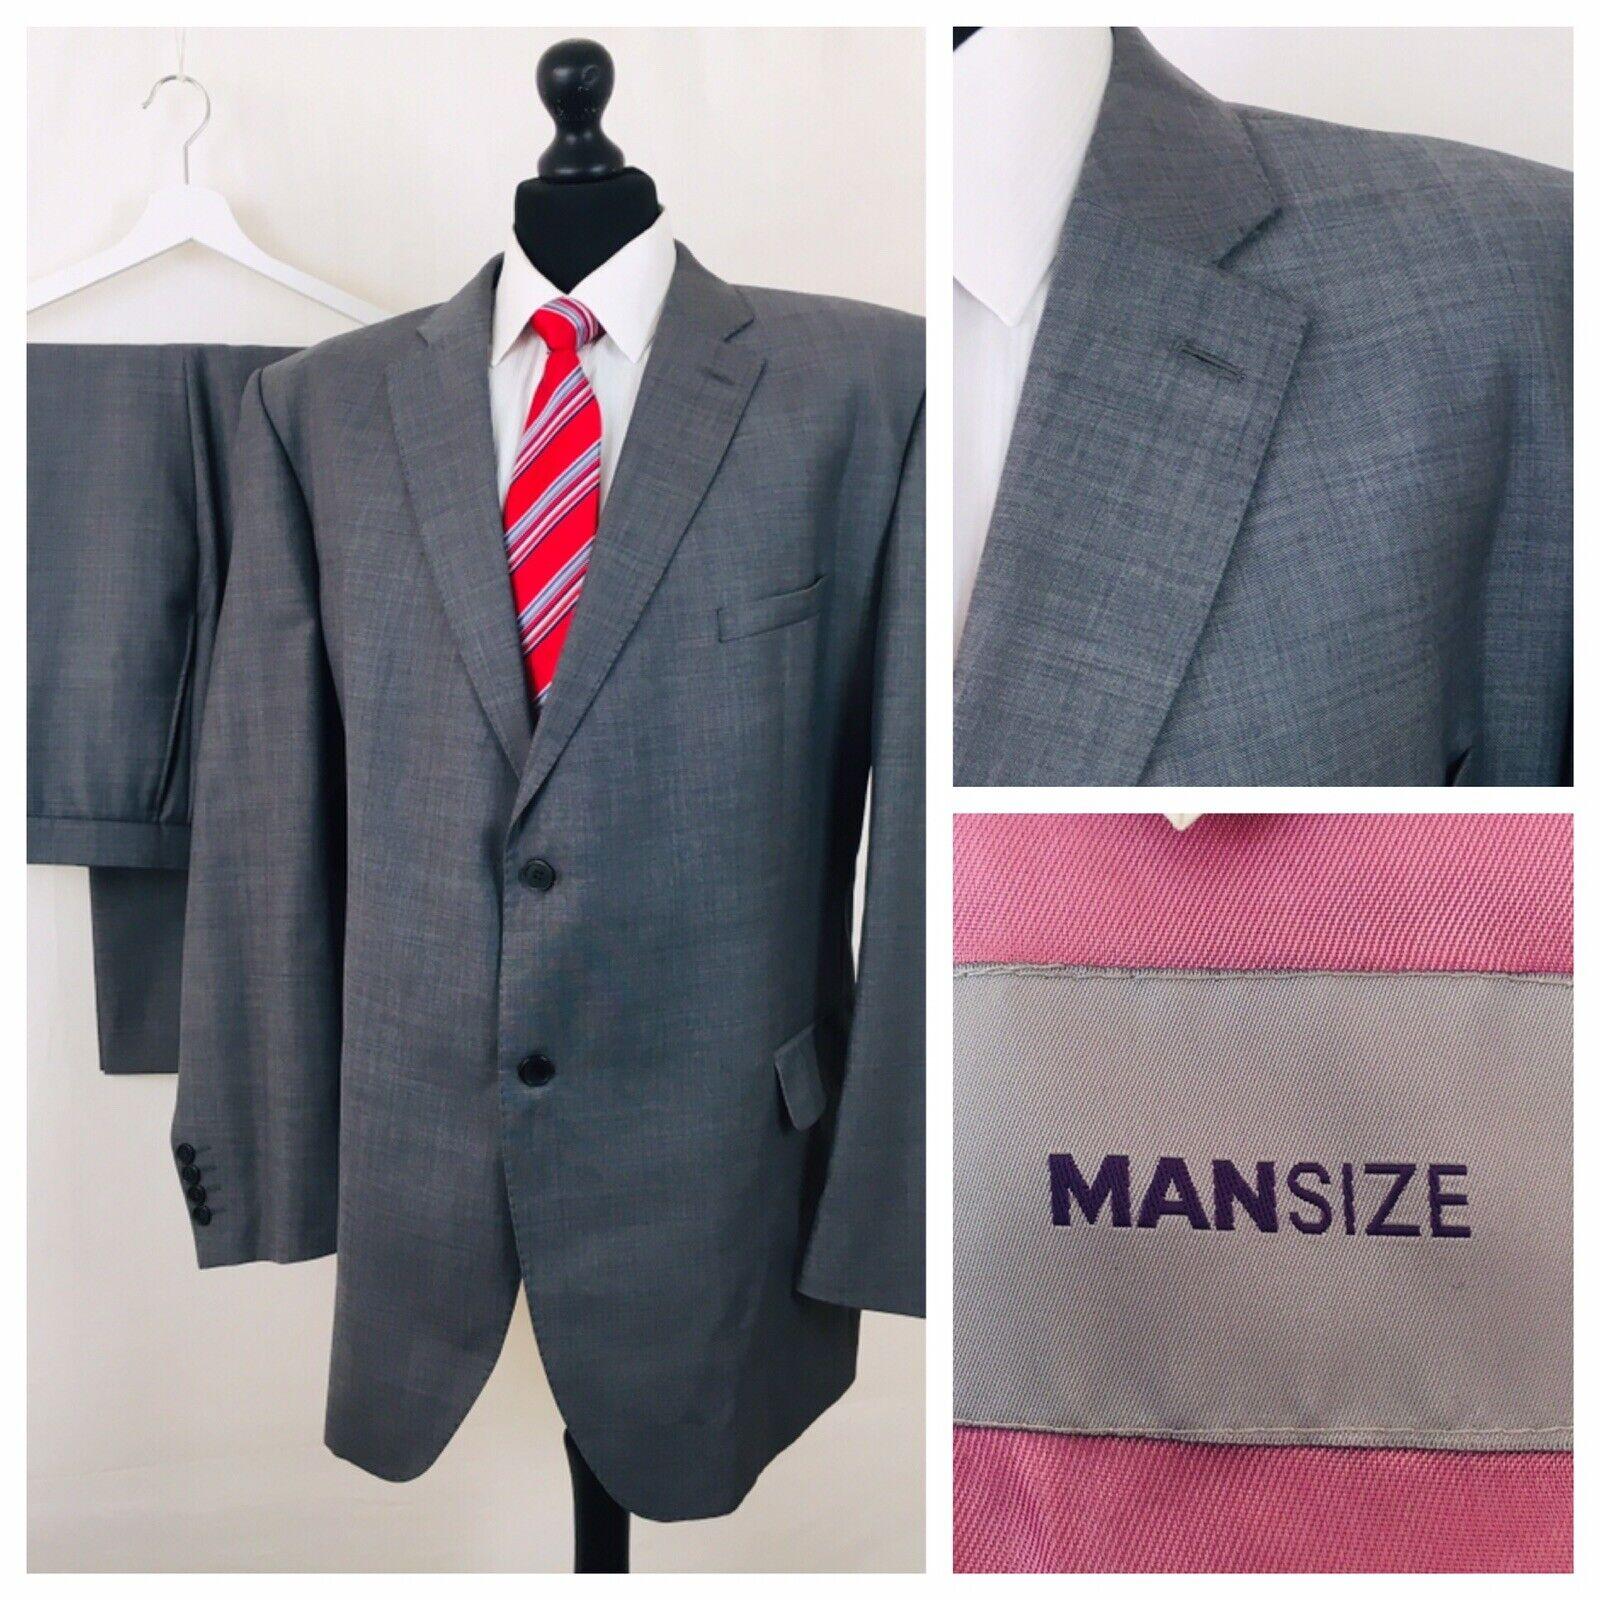 Man Size Mens Suit 52R 38W 31L Grey Wool Blend Formal Business  YE236